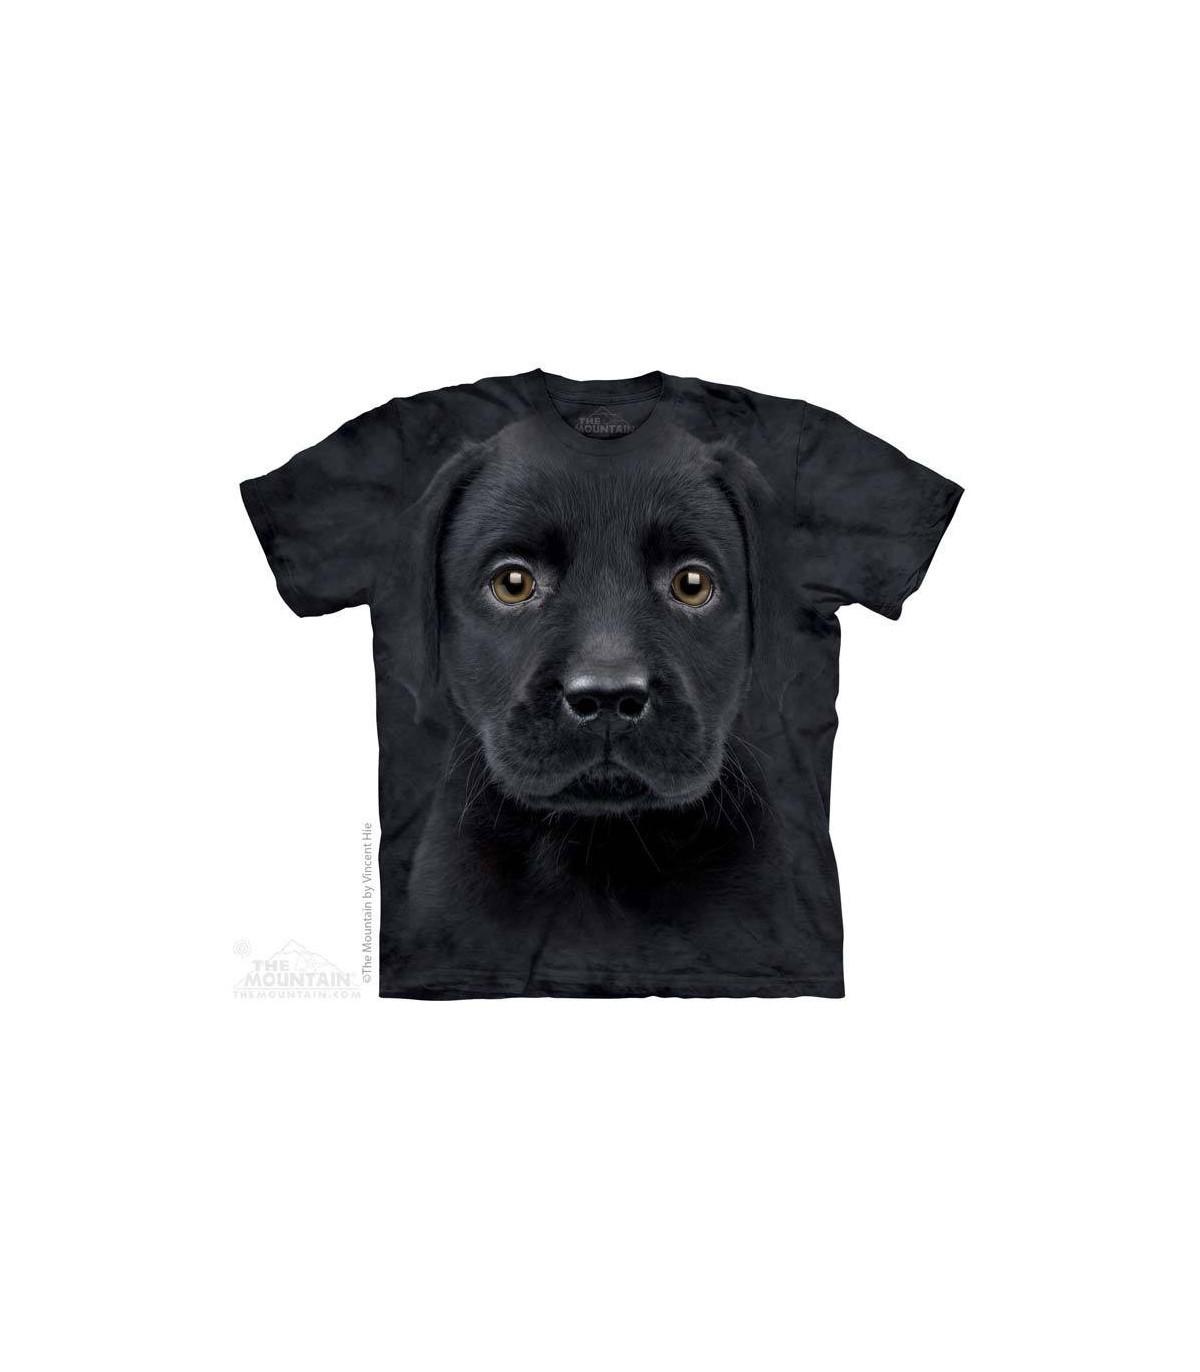 The Mountain Black Lab Labrador Retriever Dog Puppy Hoodie Sweatshirt Jacket